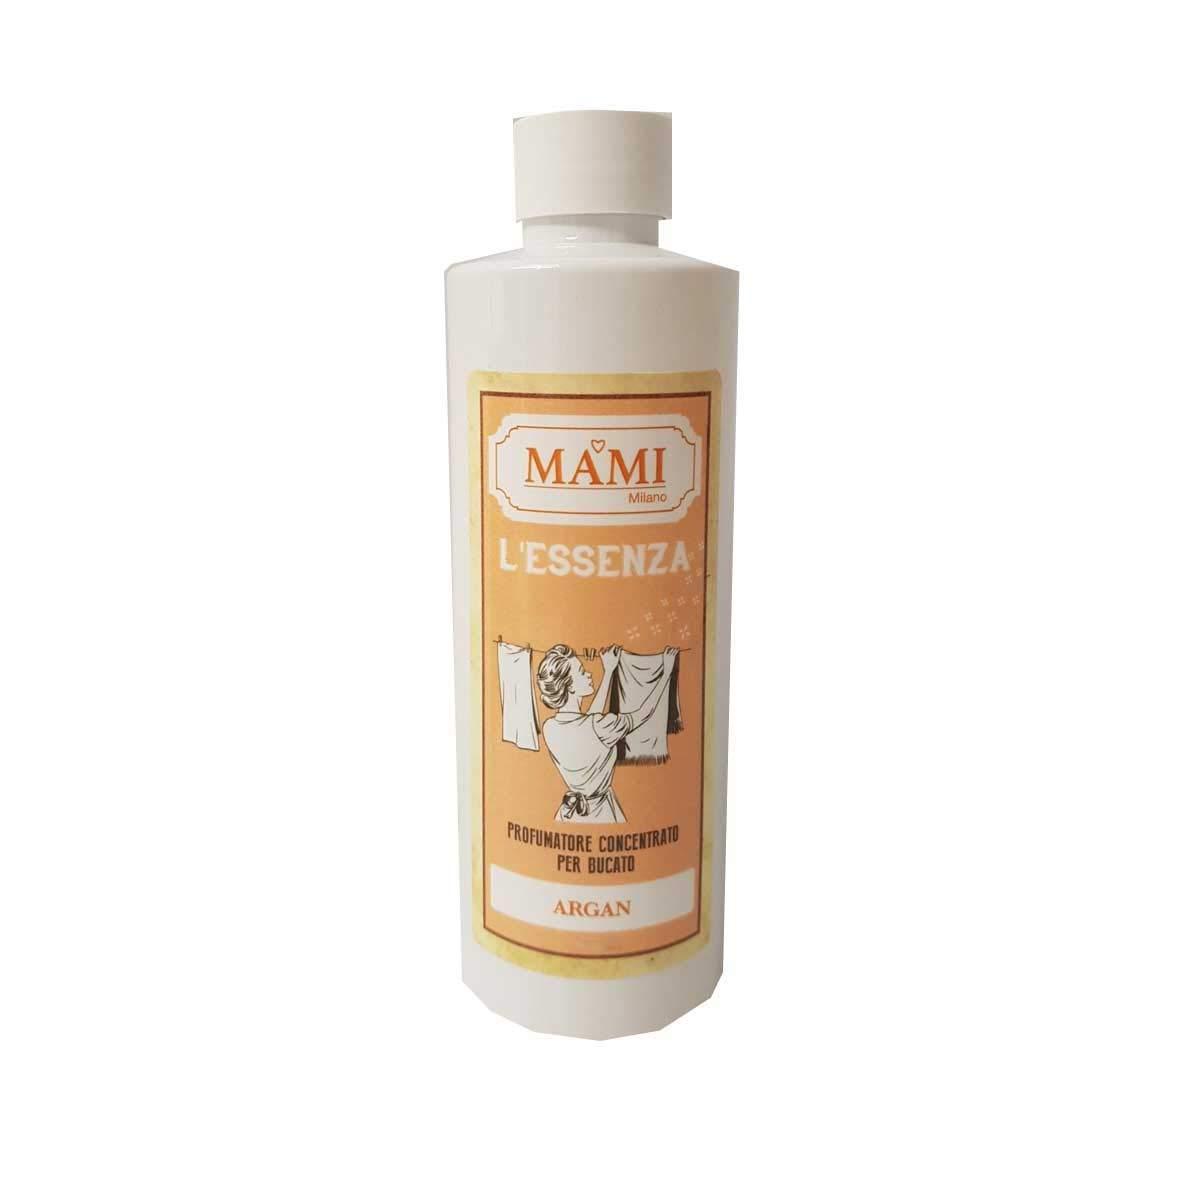 Mami Milano - Suavizante para ropa de Esencia Argan, 500 ml ...